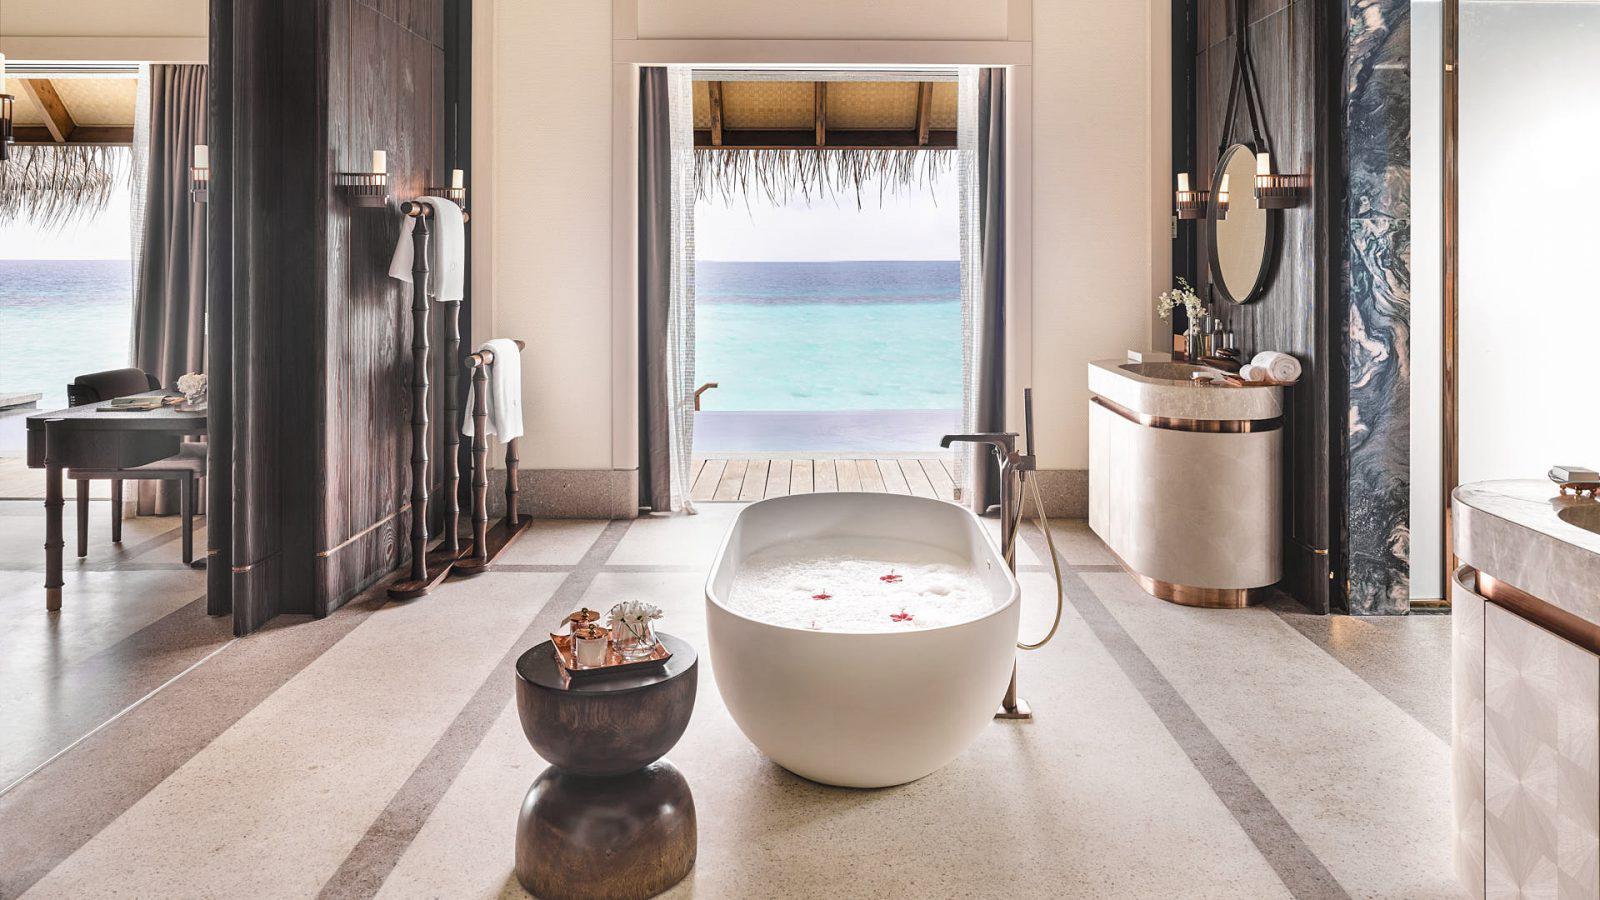 Joali Maldives Luxury Resort - Muravandhoo Island, Maldives - Water Villa Master Bathroom